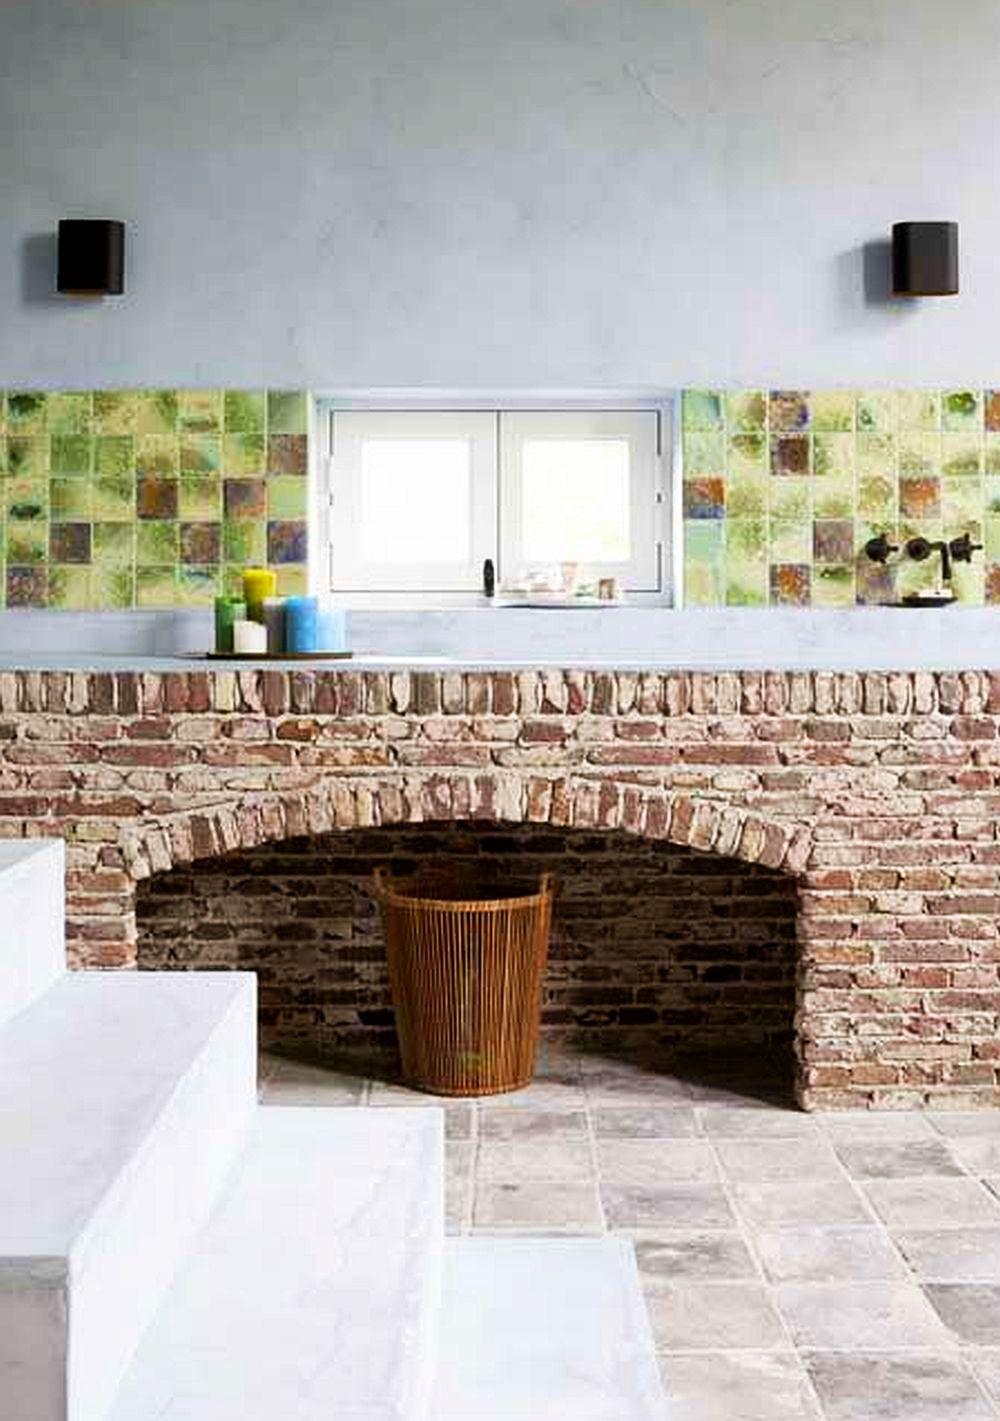 adelaparvu.com about modern farm, designer Larissa van Seumeren, Photo Viva Vida and Living Agency (41)